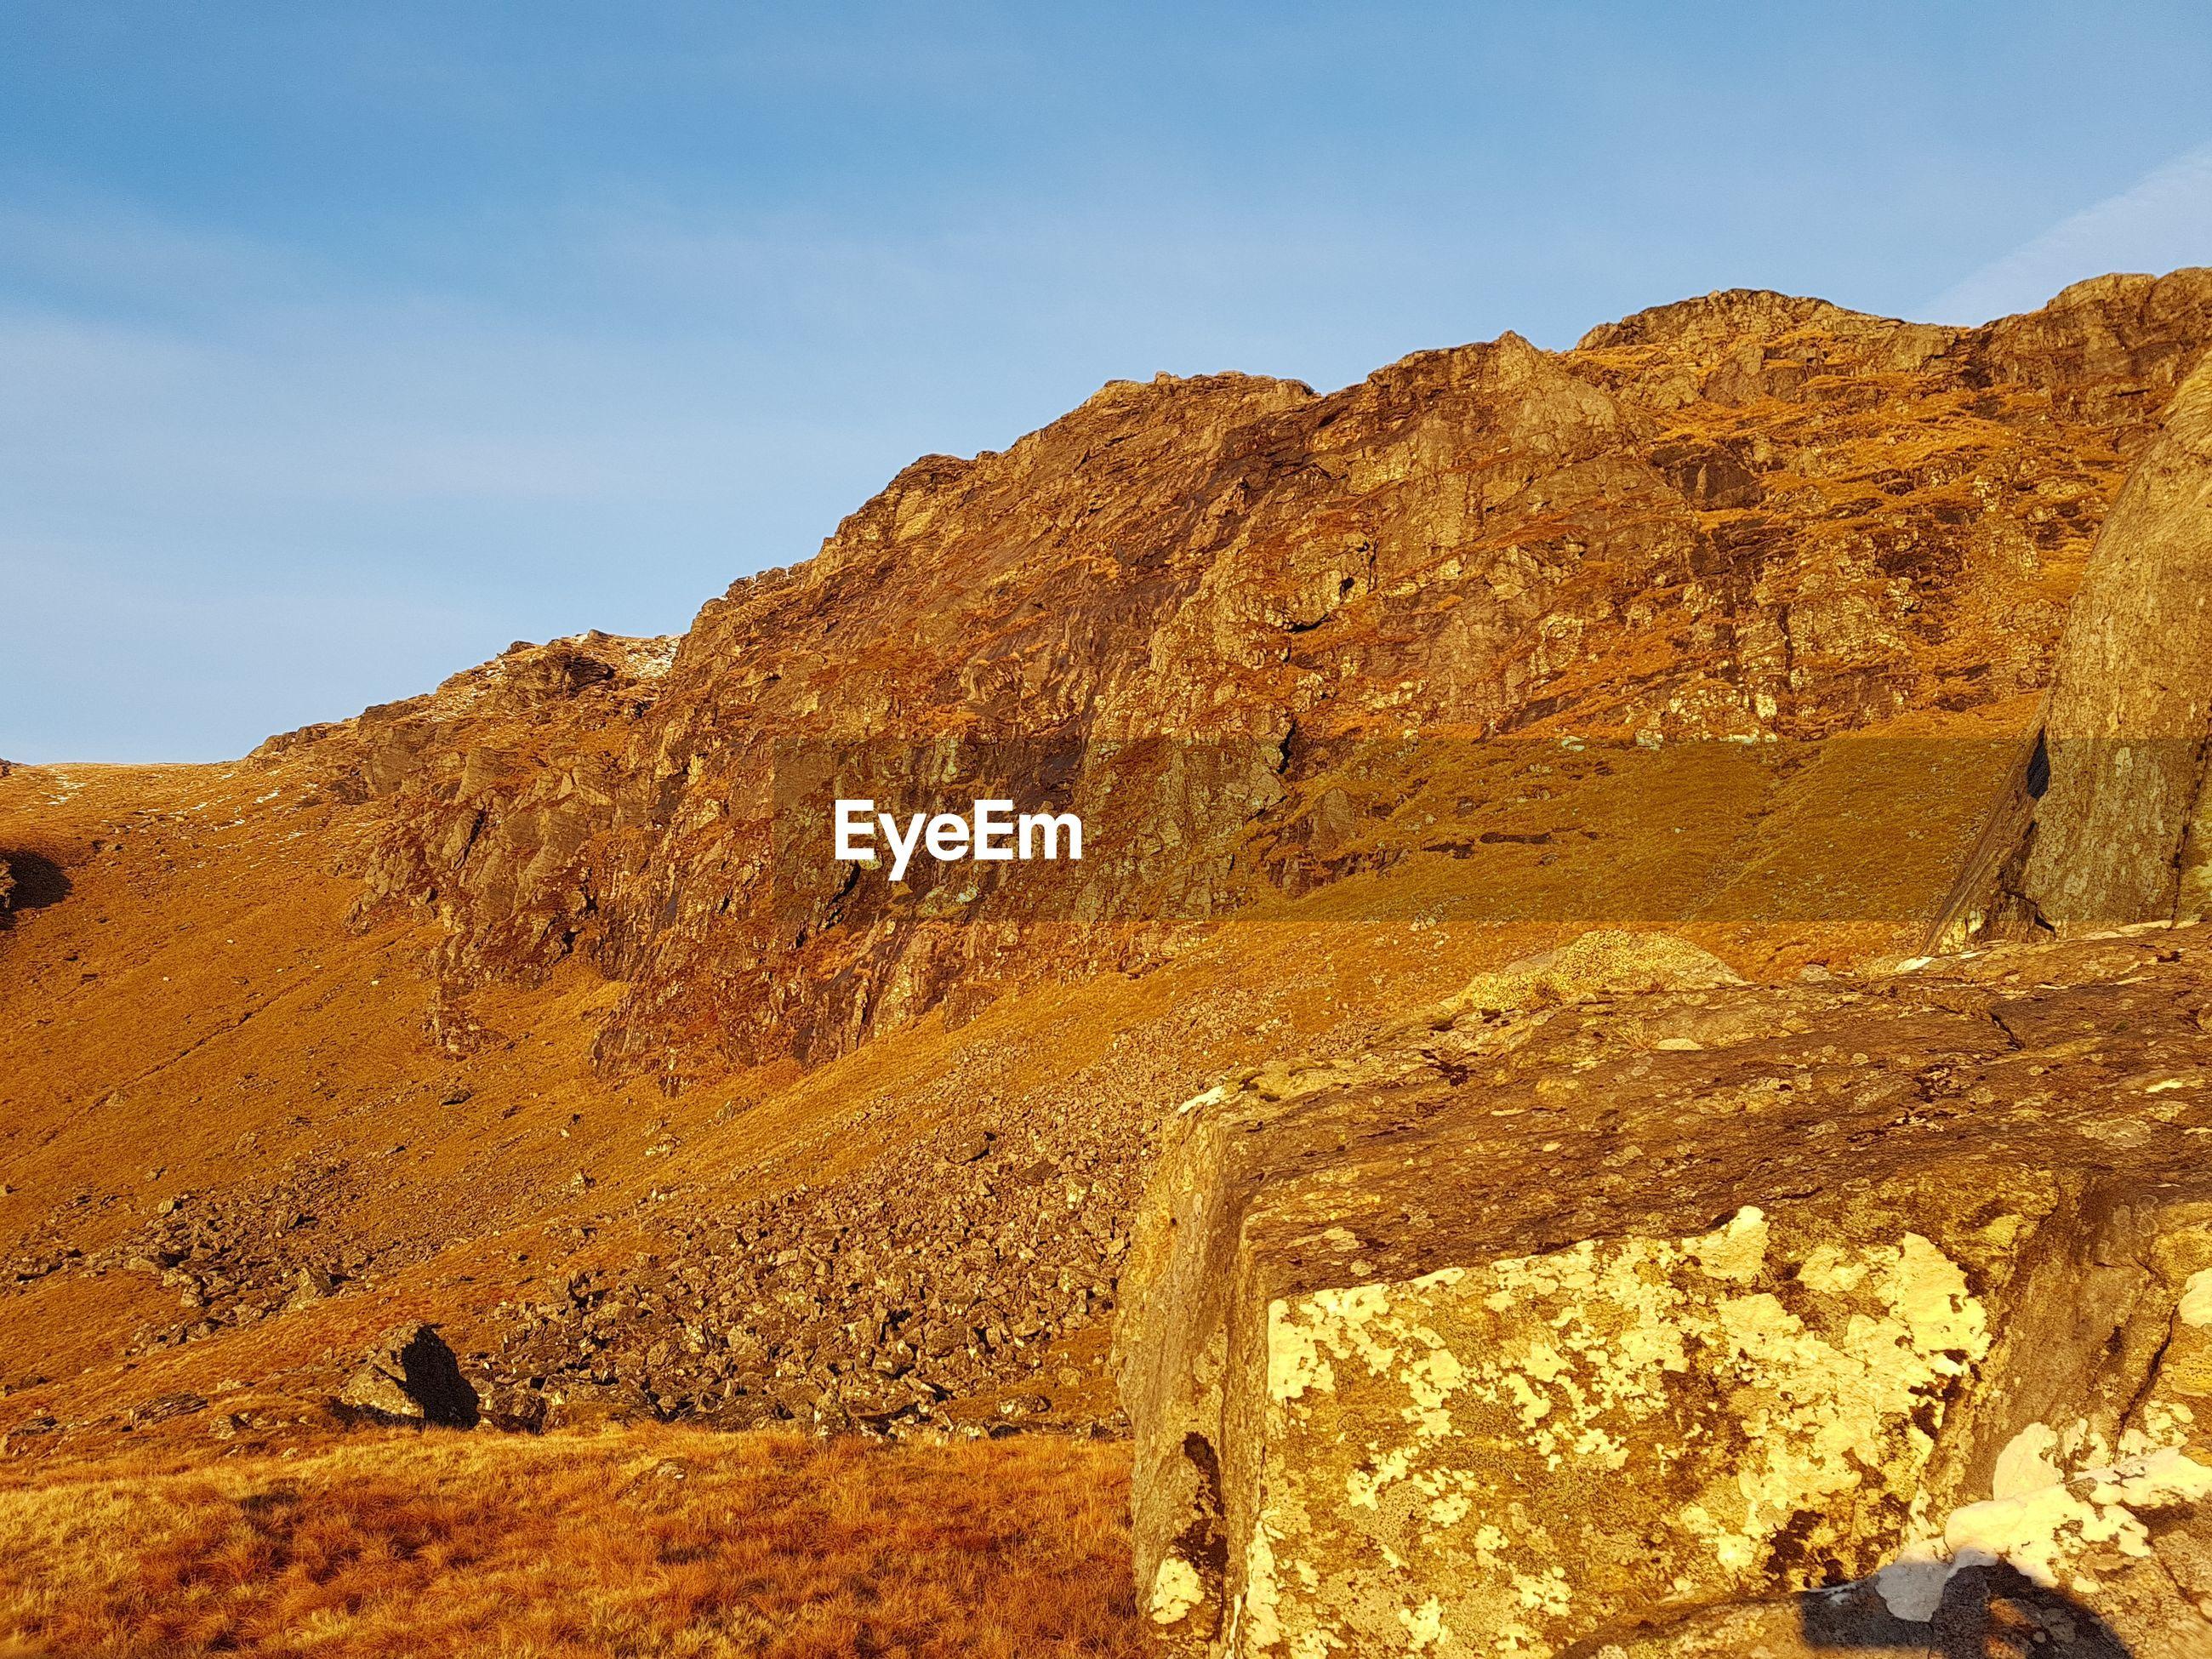 Ben dorain, bridge of orchy, golden sunset  on rocks